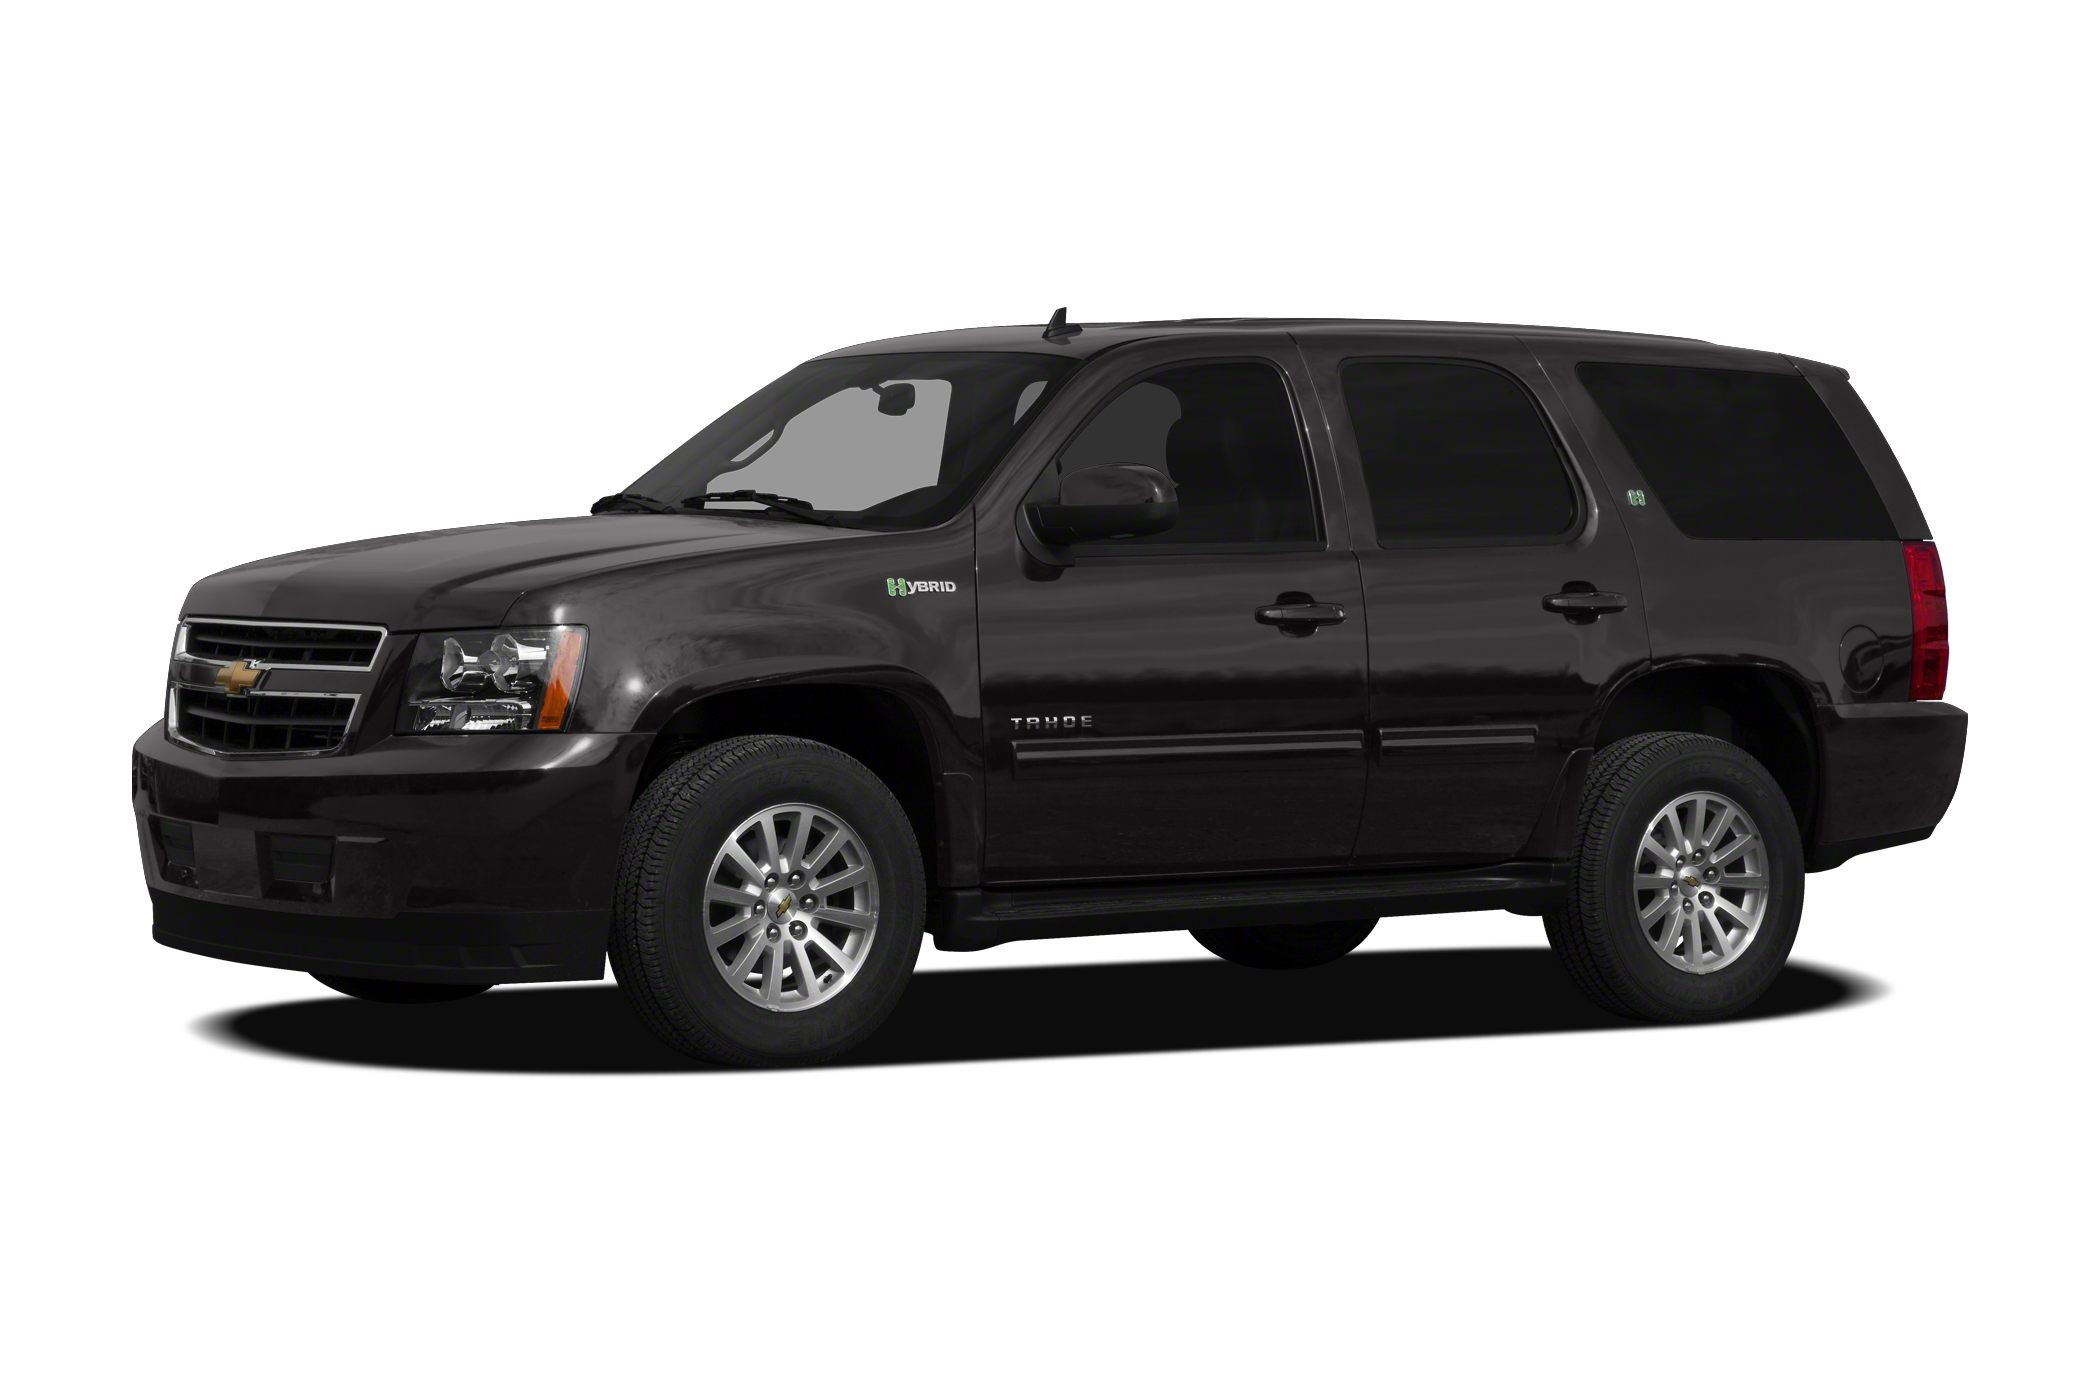 2009 Chevrolet Tahoe Hybrid SUV for sale in Hazlehurst for $19,975 with 103,000 miles.